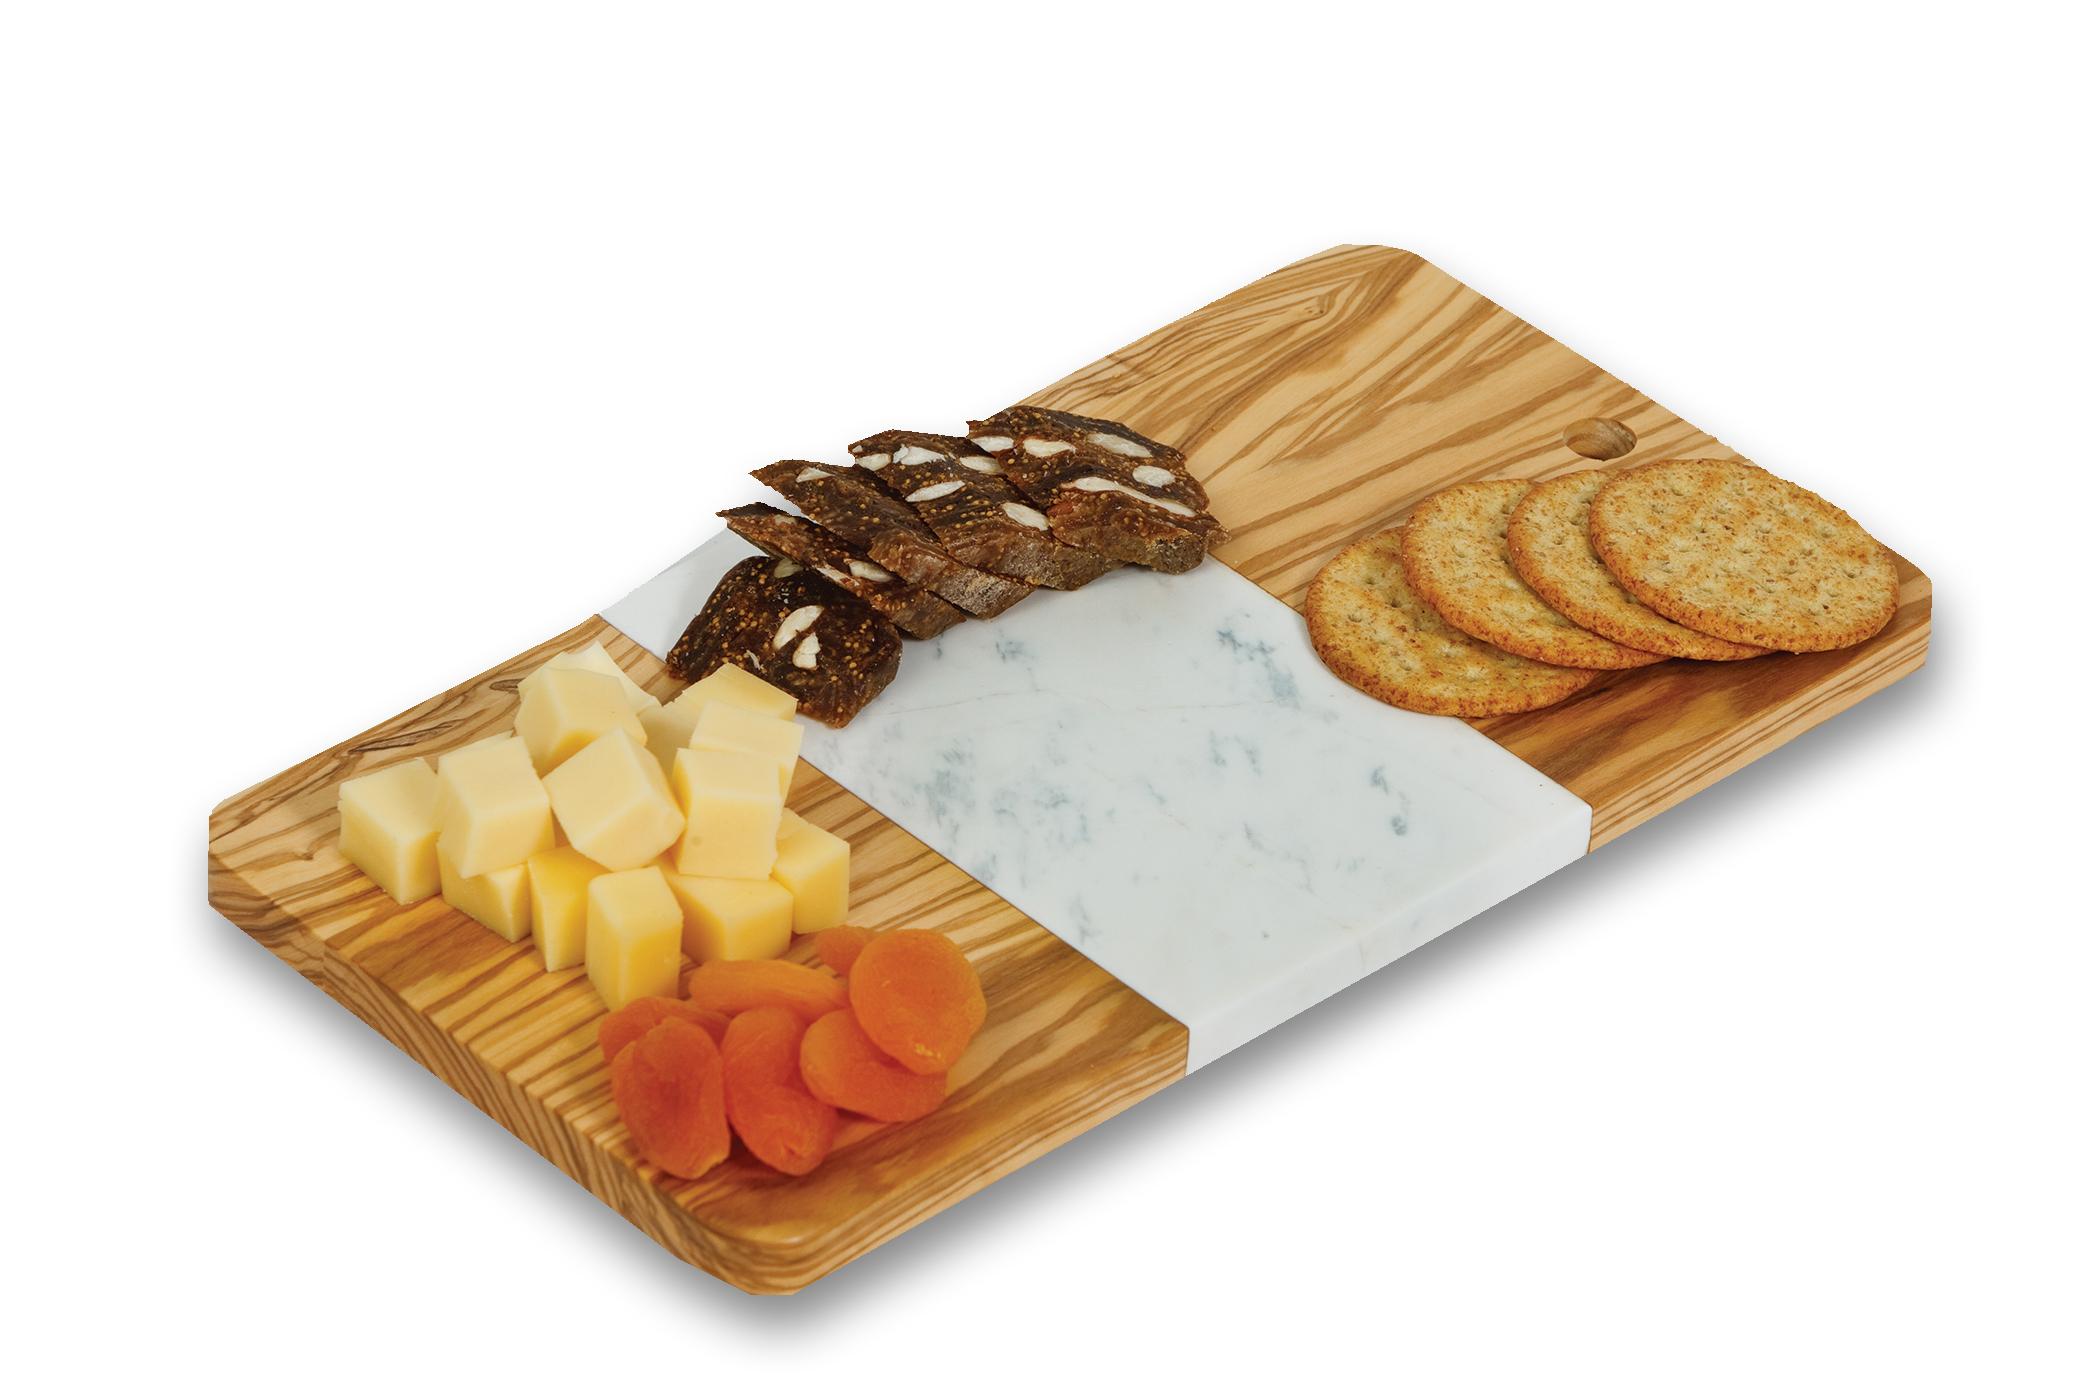 2132_psm-554-crema-cutting-board